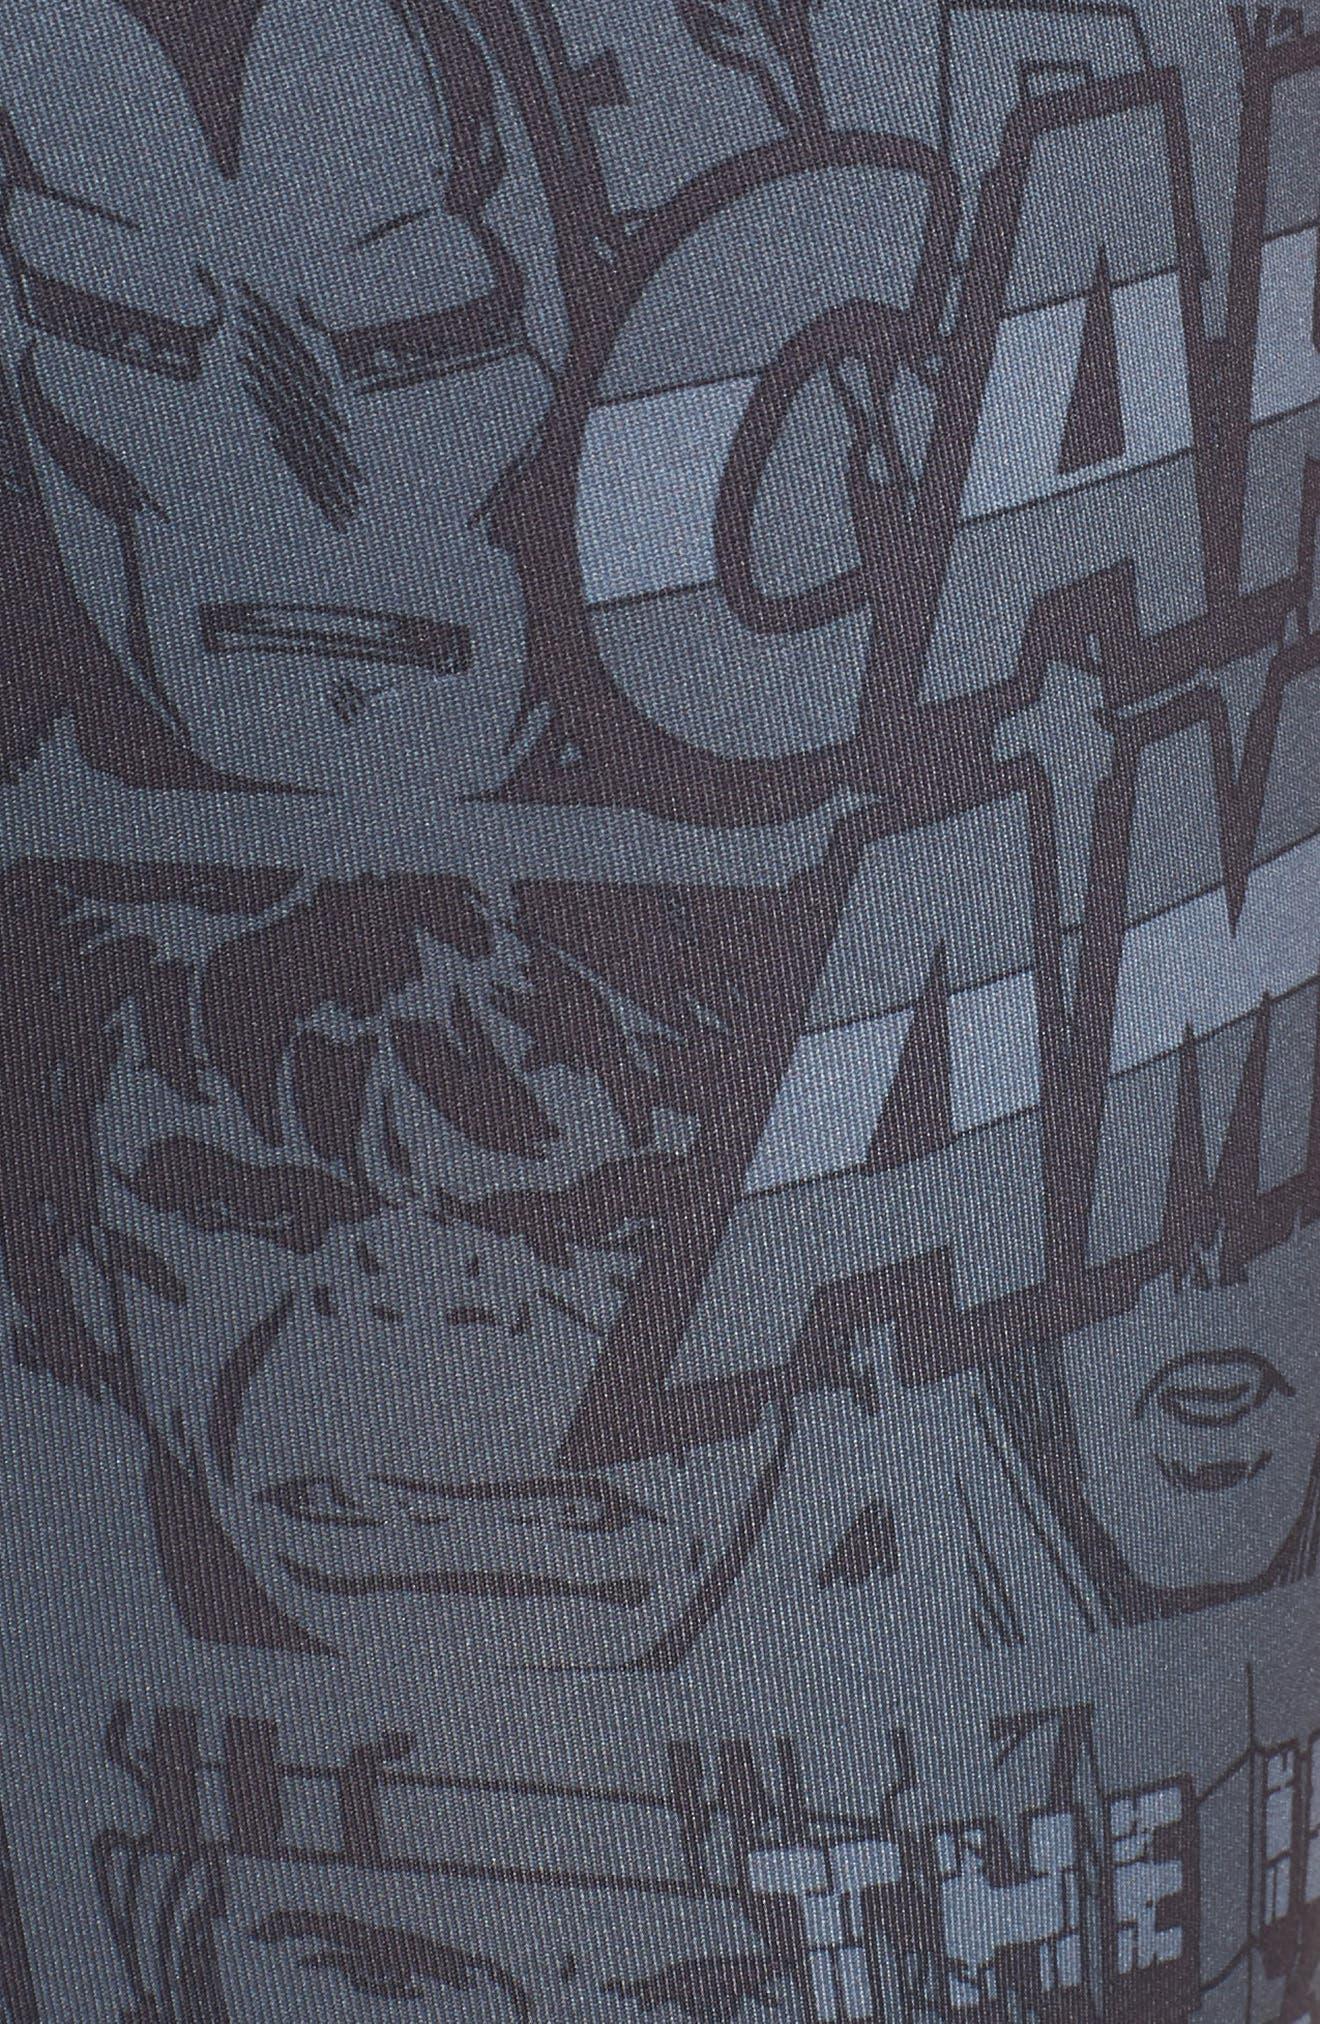 Marvel Boxer Briefs,                             Alternate thumbnail 5, color,                             BLACK